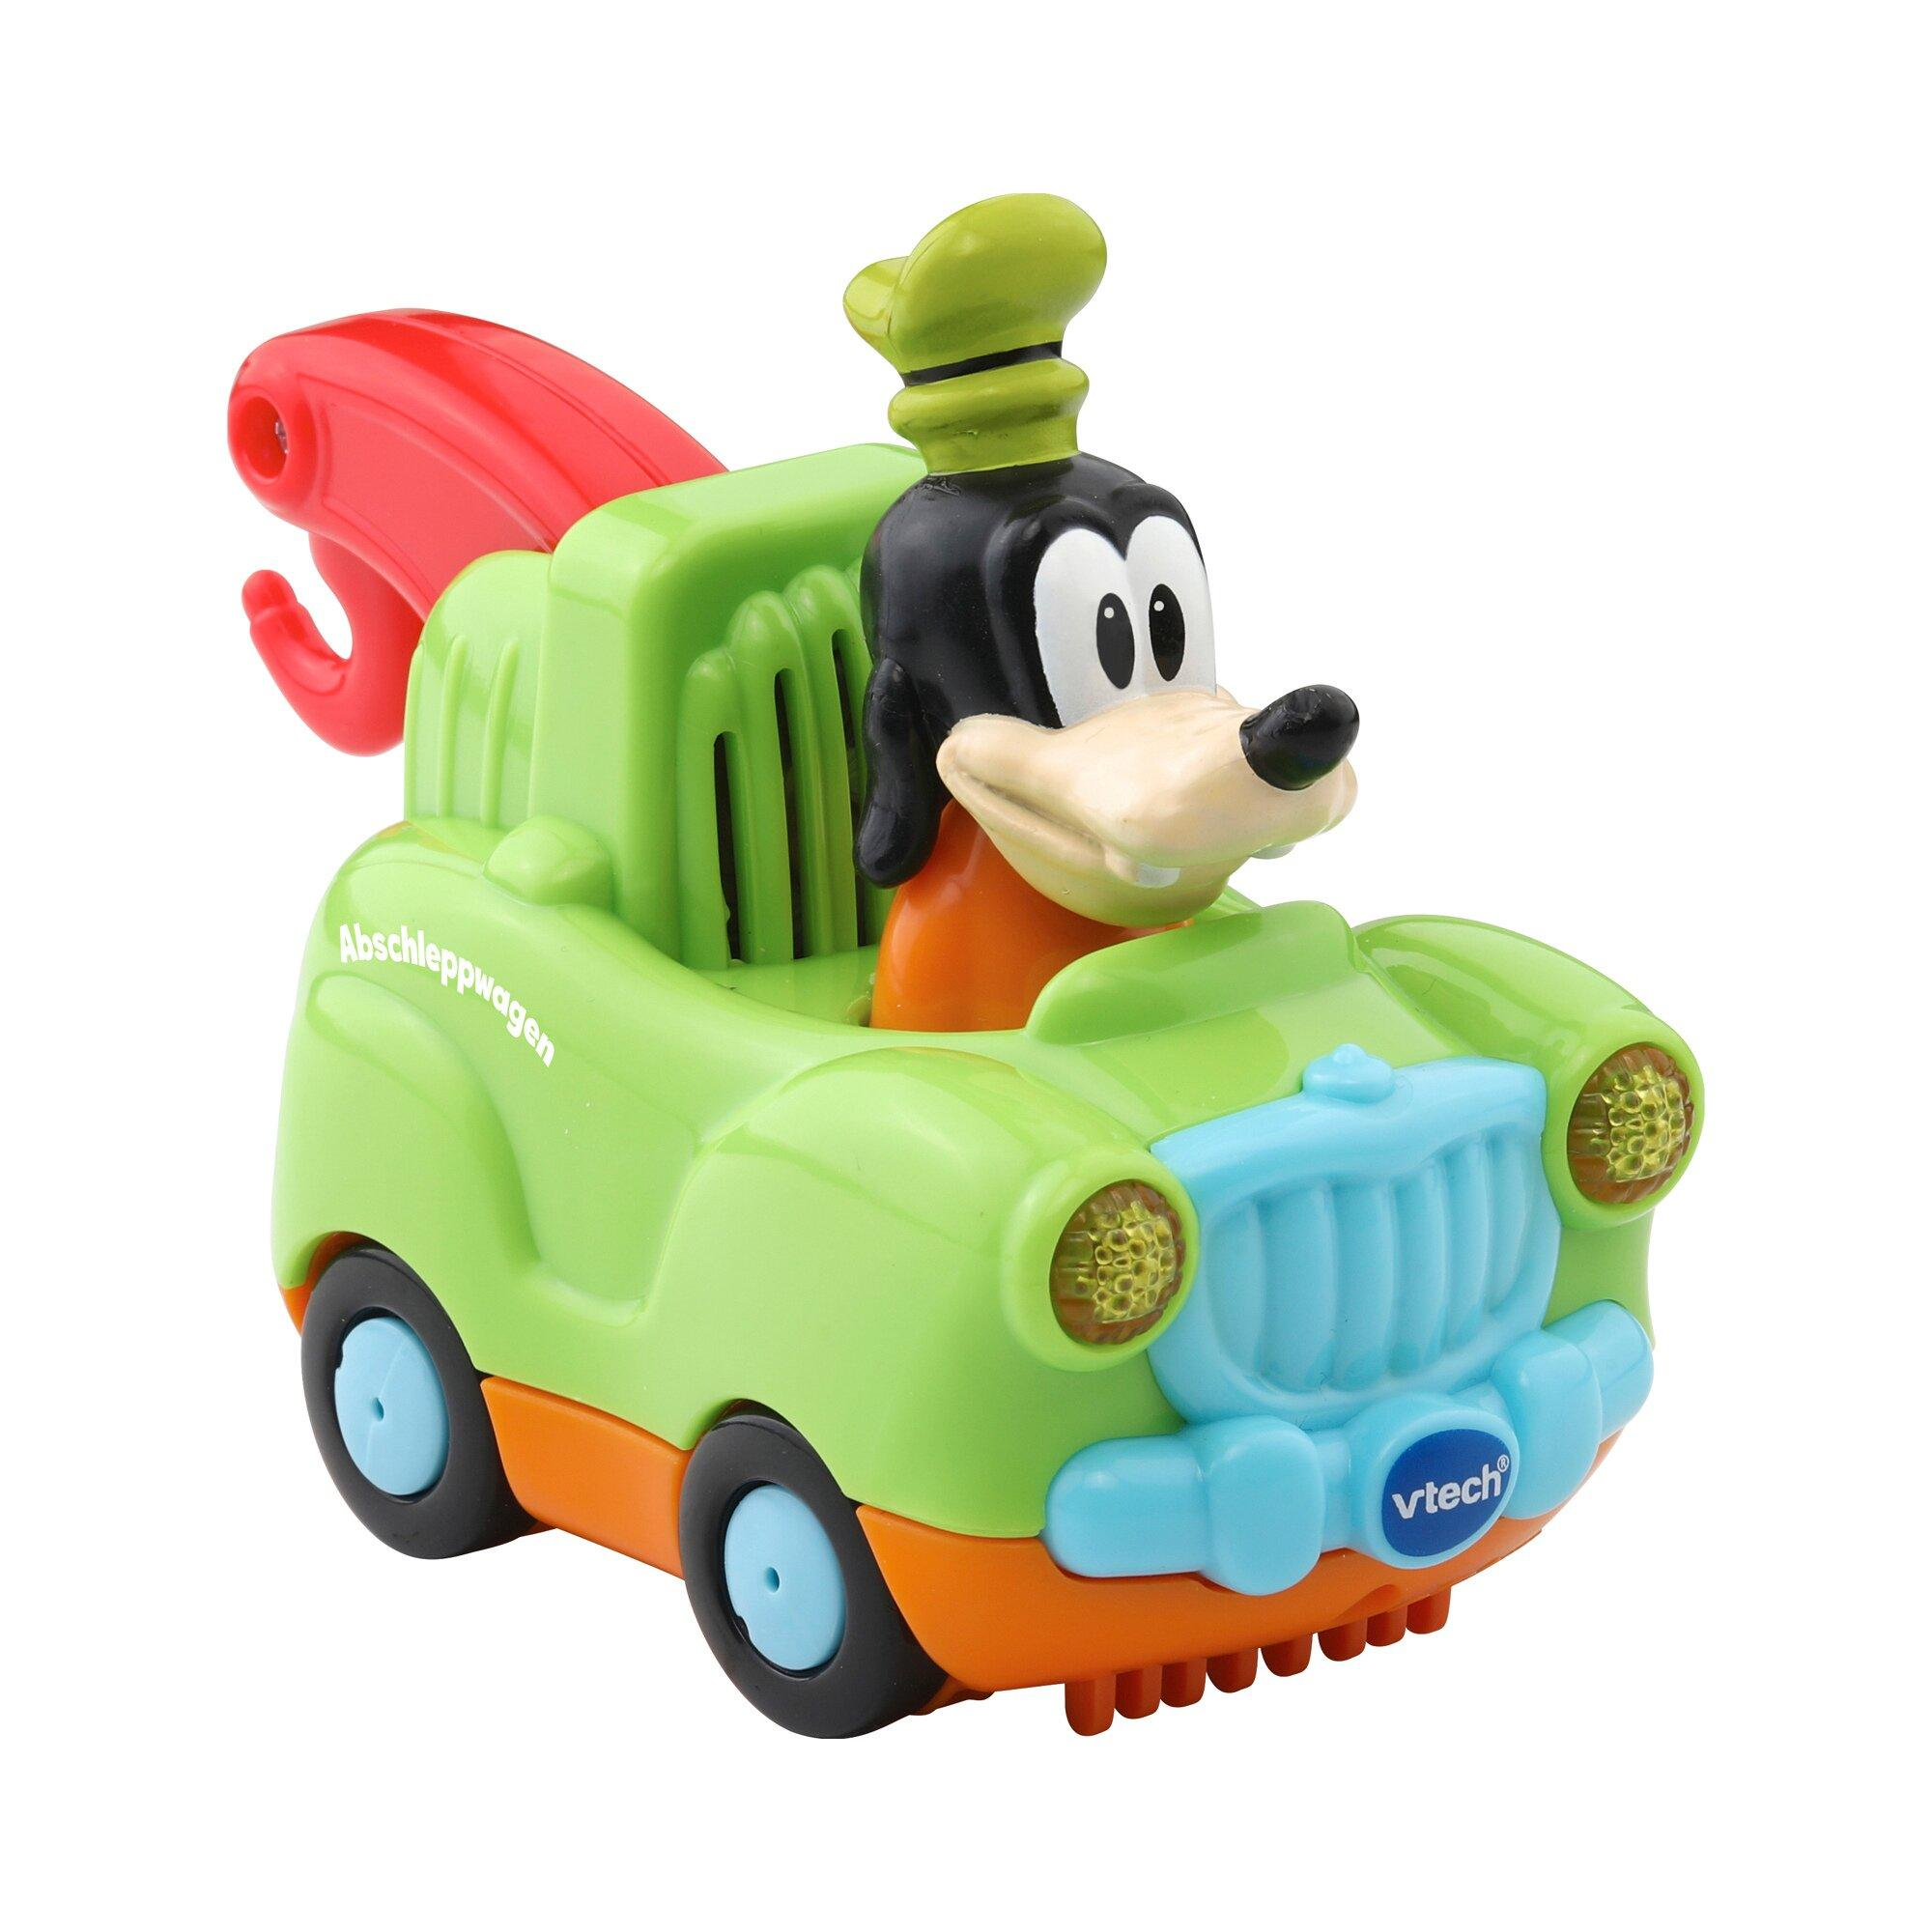 Goofys Abschleppwagen